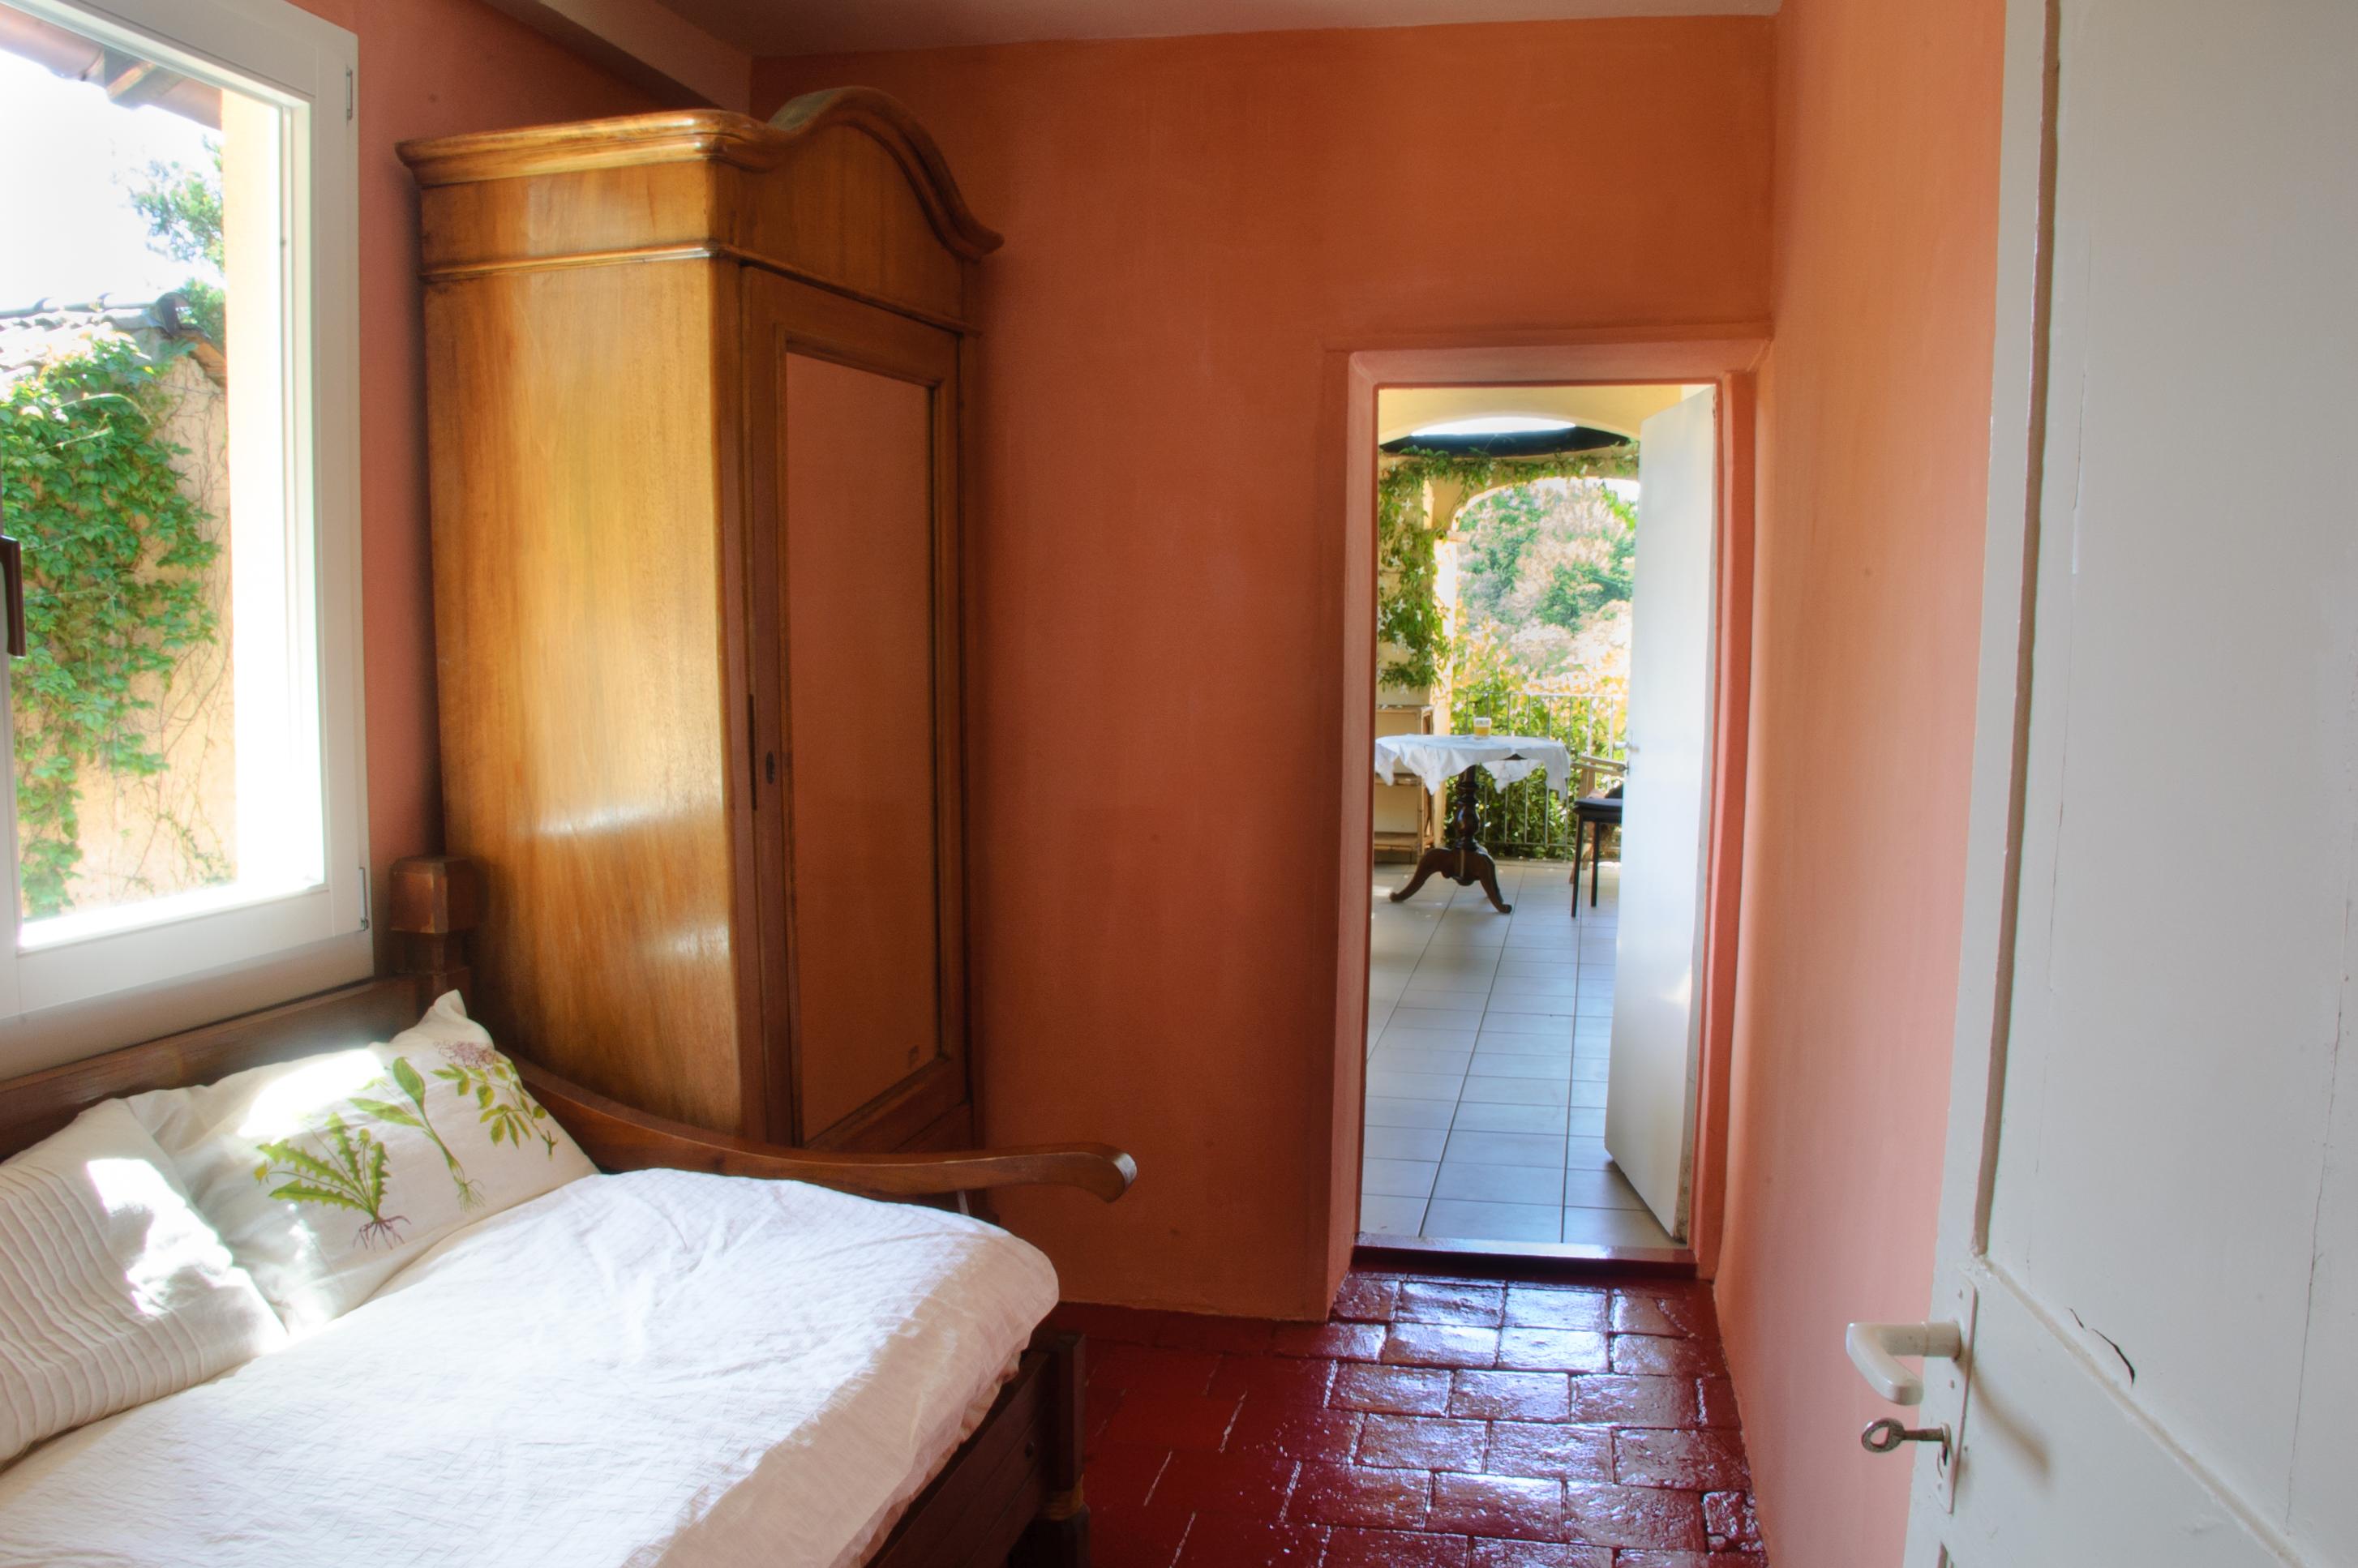 Camera rosa antico2